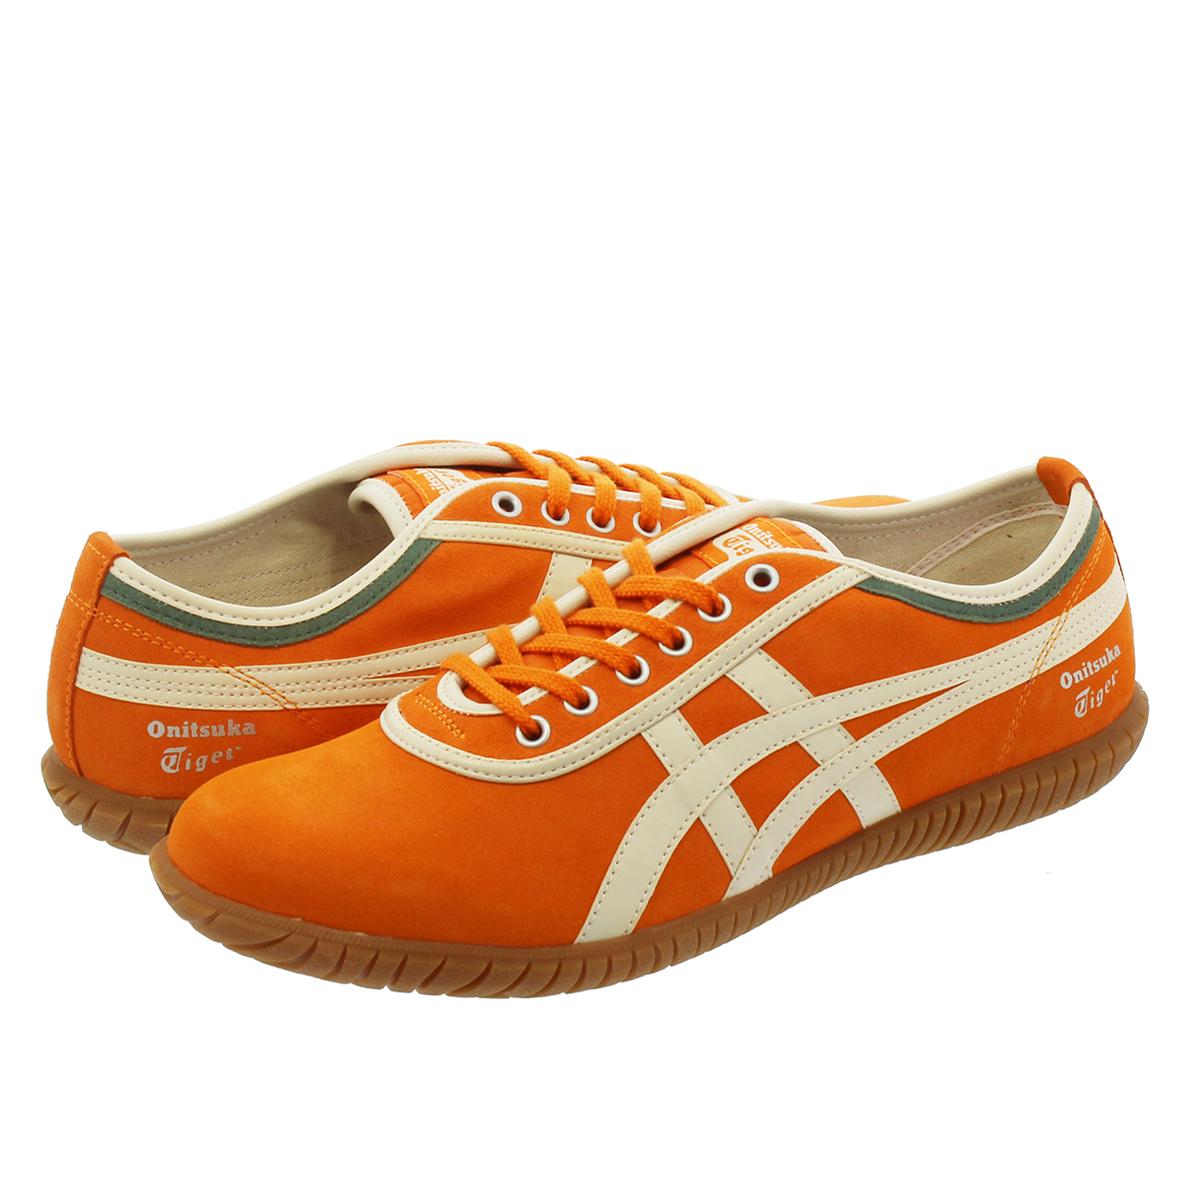 sports shoes 8ece5 b8bfe Onitsuka Tiger TSUNAHIKI Onitsuka tiger tuna toad LAVA ORANGE/OATMEAL  1183a085-800